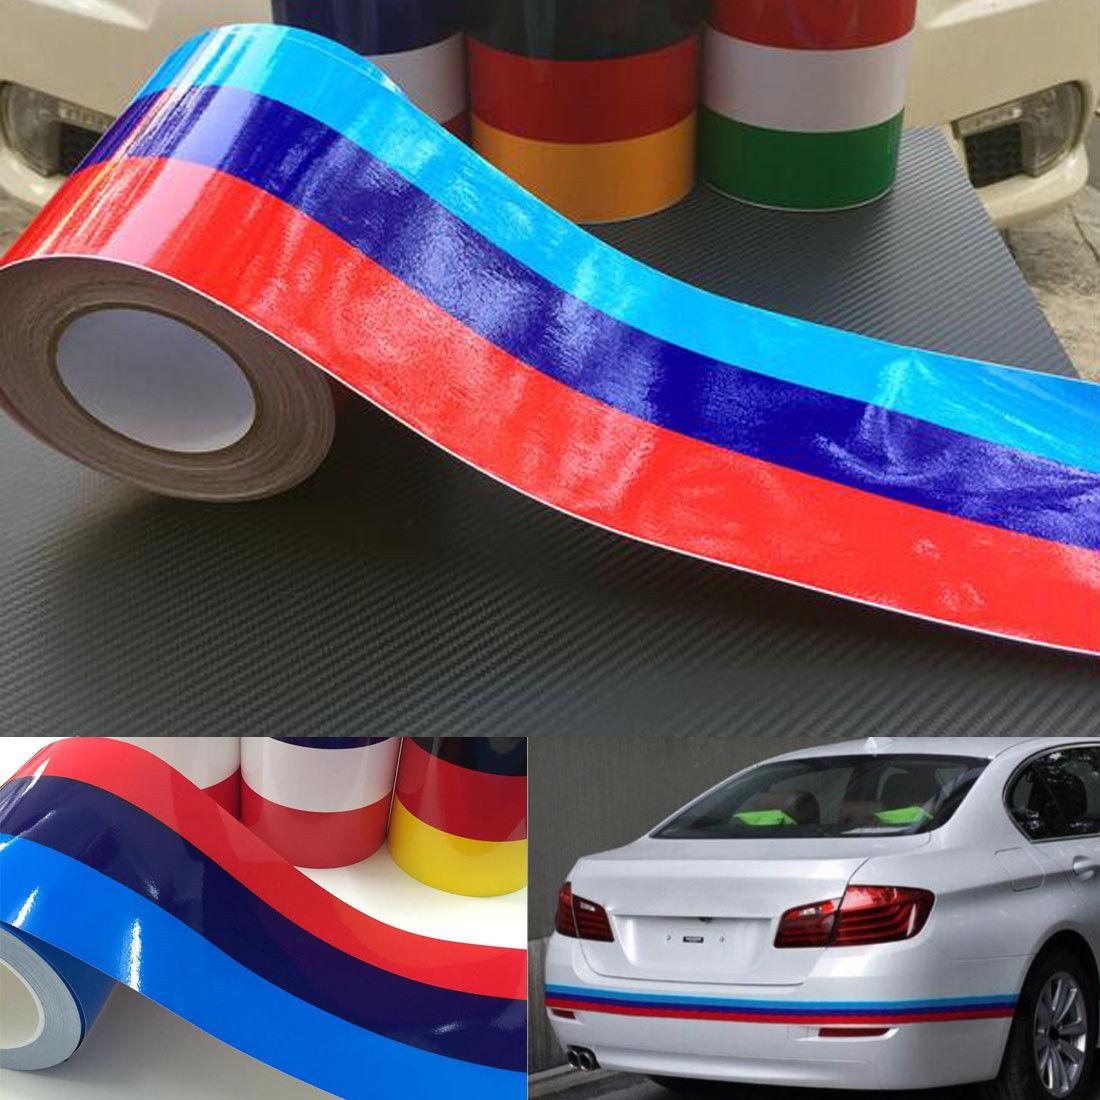 M-Colored Stripe Sticker Car Vinyl Decal For BMW M3 M4 M5